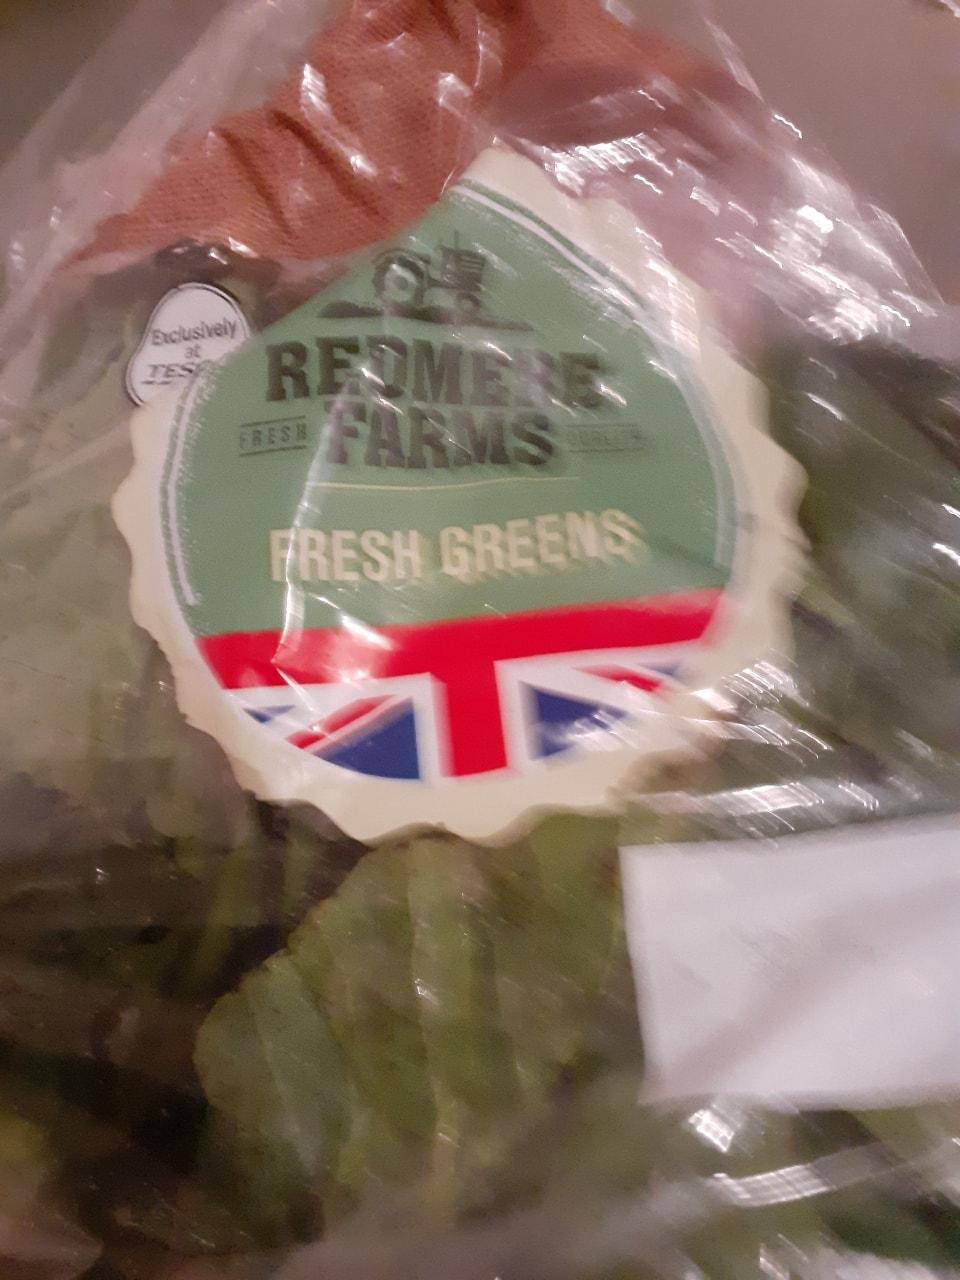 Redmere farms fresh green